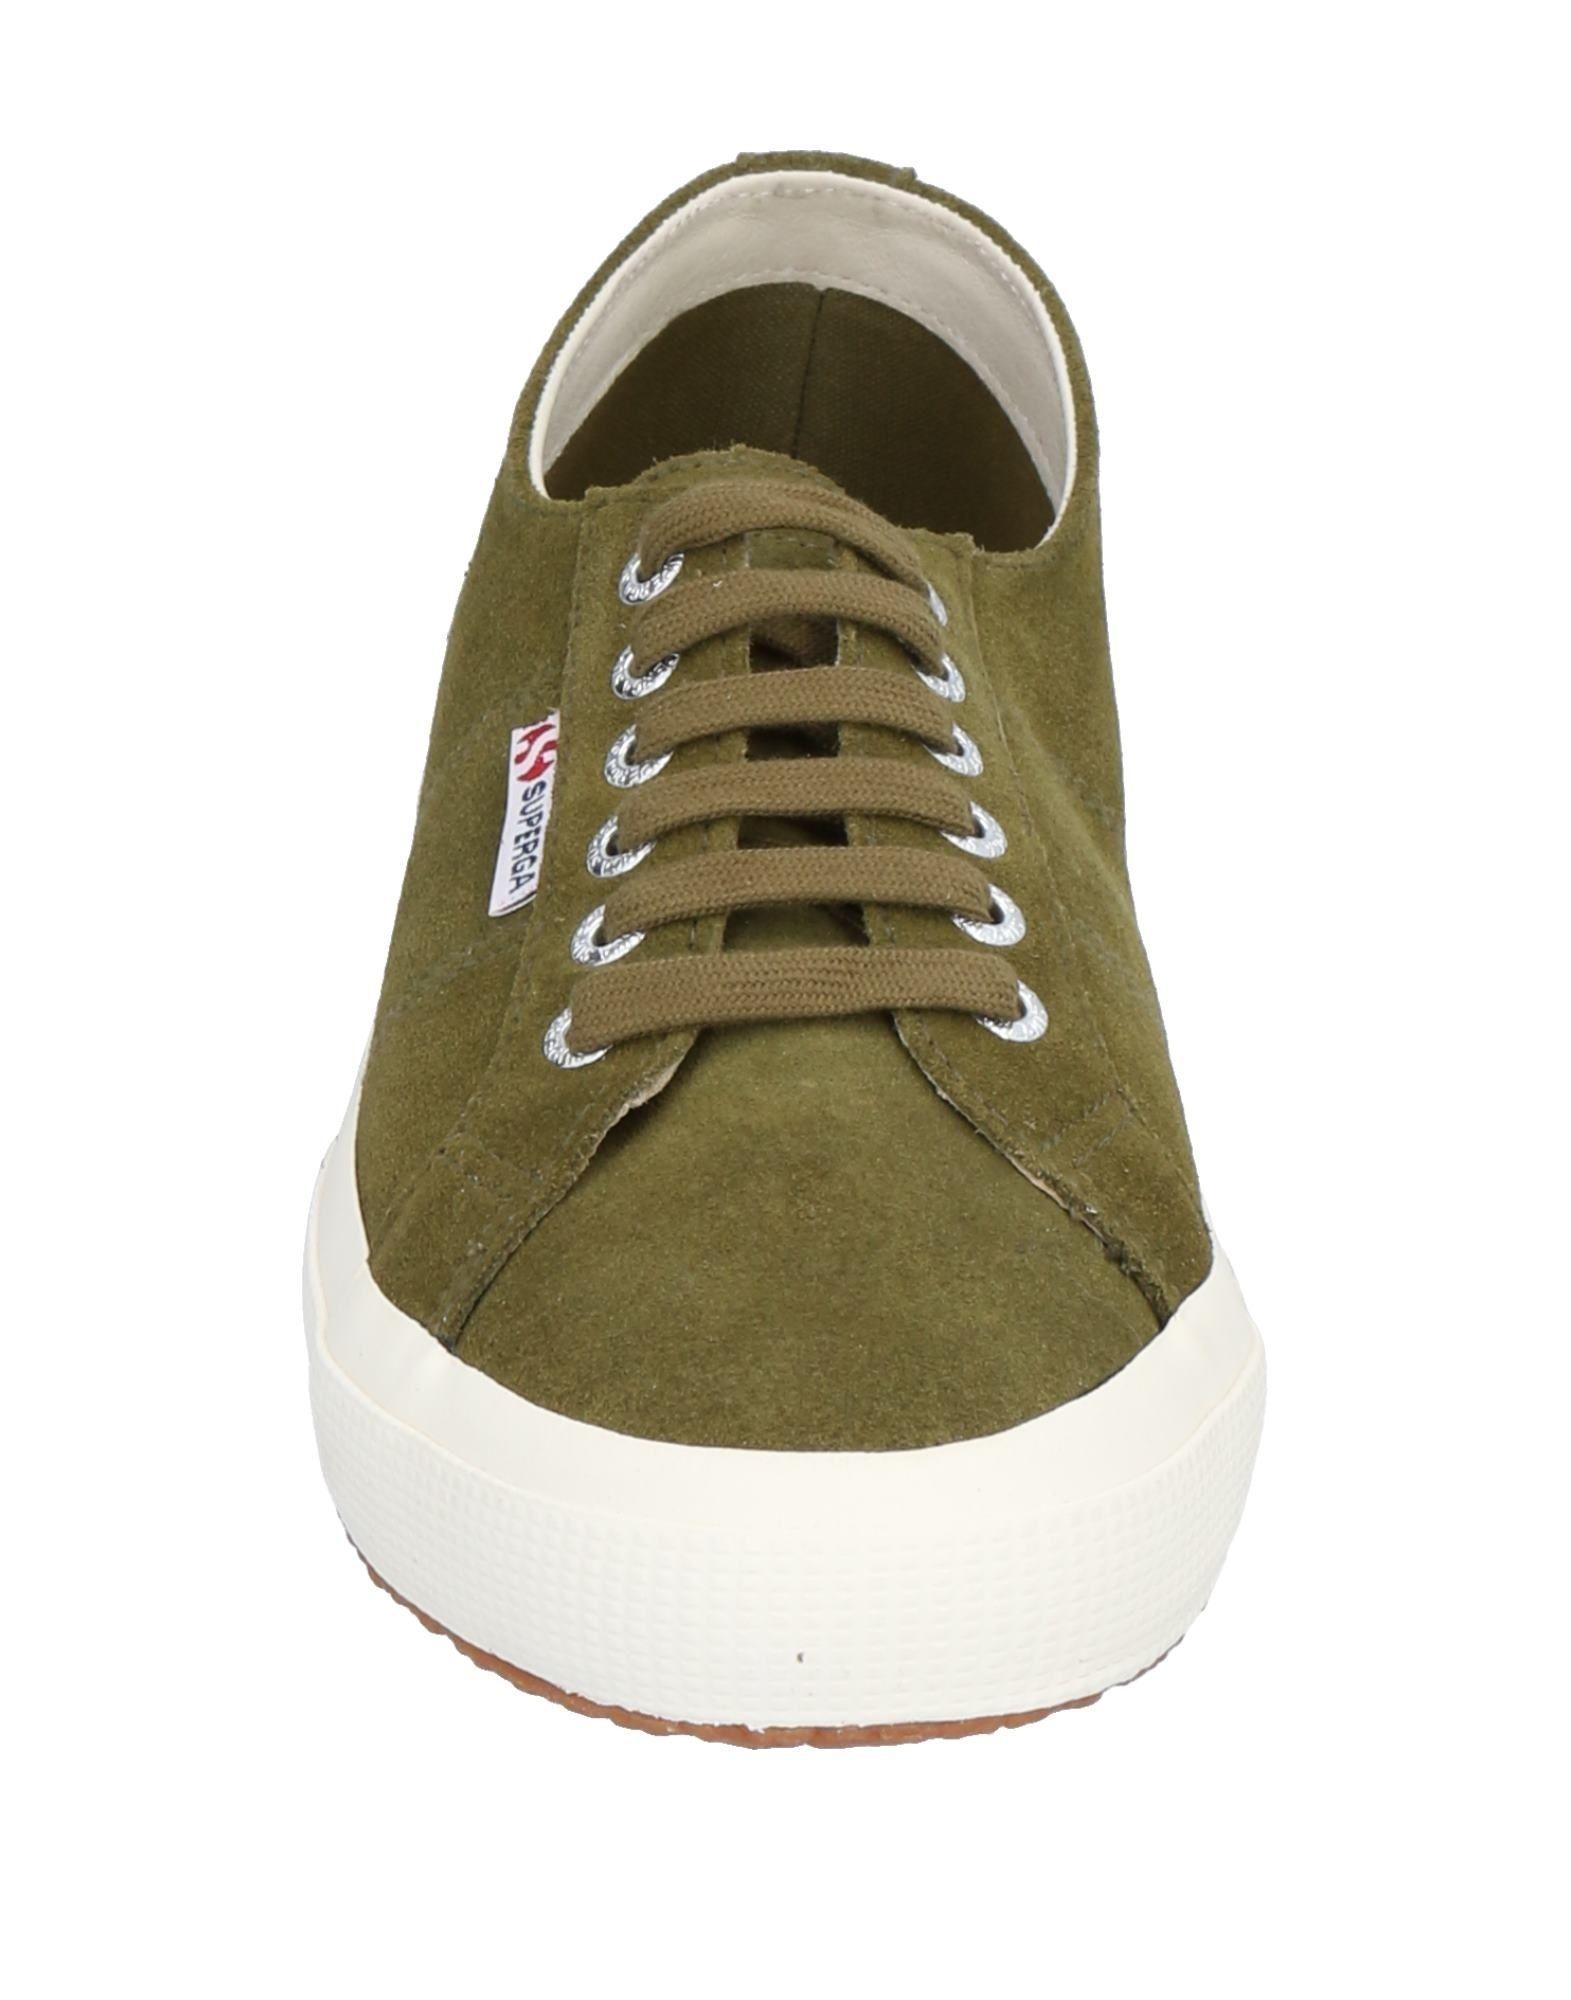 Superga® Sneakers Herren  11237178GC 11237178GC  251c2a